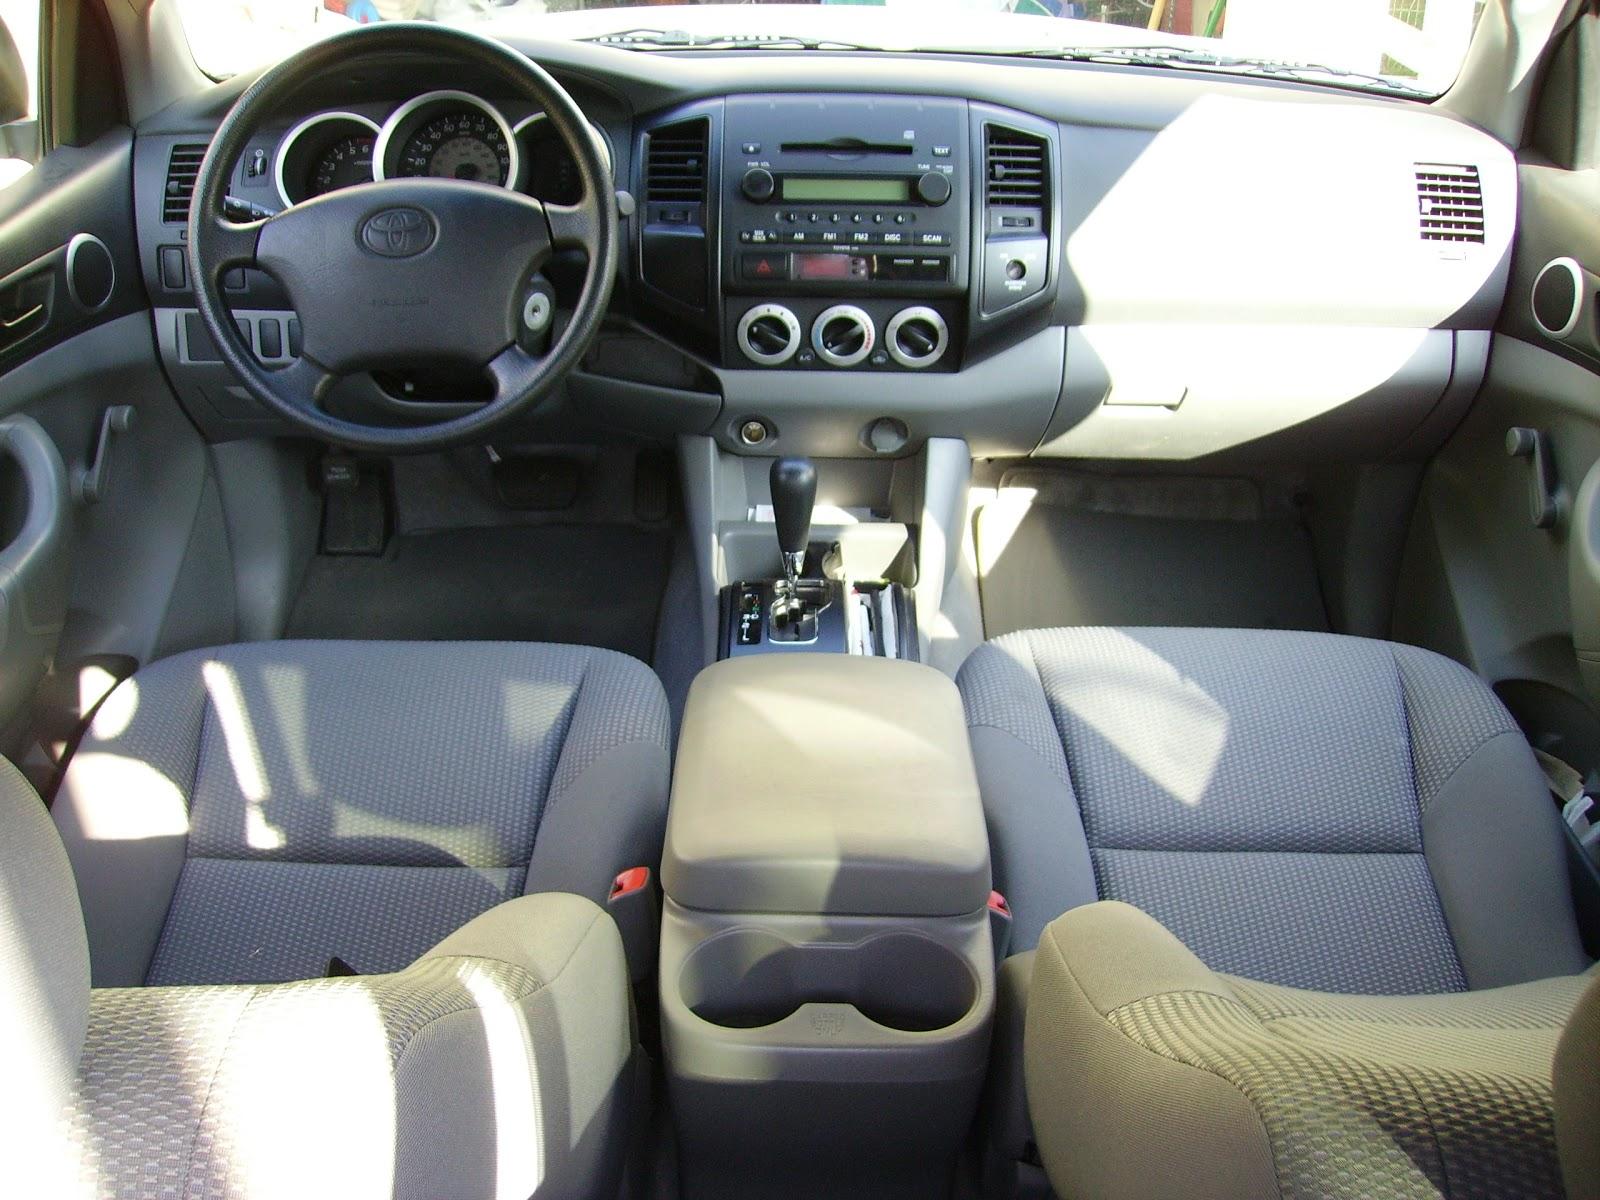 Toyota interior car models - 2013 toyota camry interior parts ...